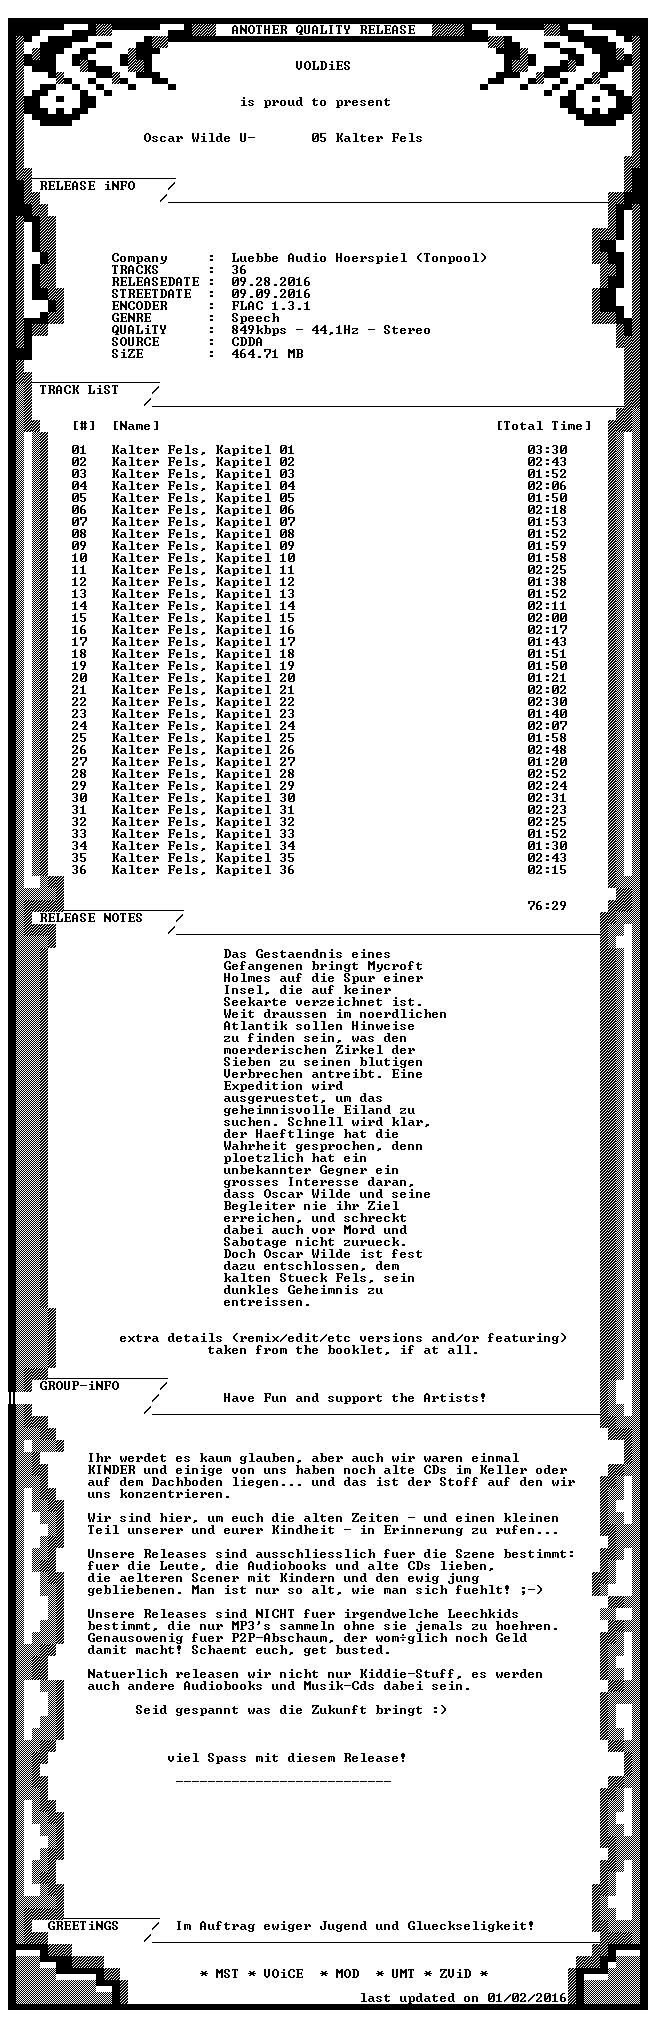 Oscar Wilde Und Mycraft Holmes-05 Kalter Fels-DE-AUDIOBOOK-CD-FLAC-2016-VOLDiES